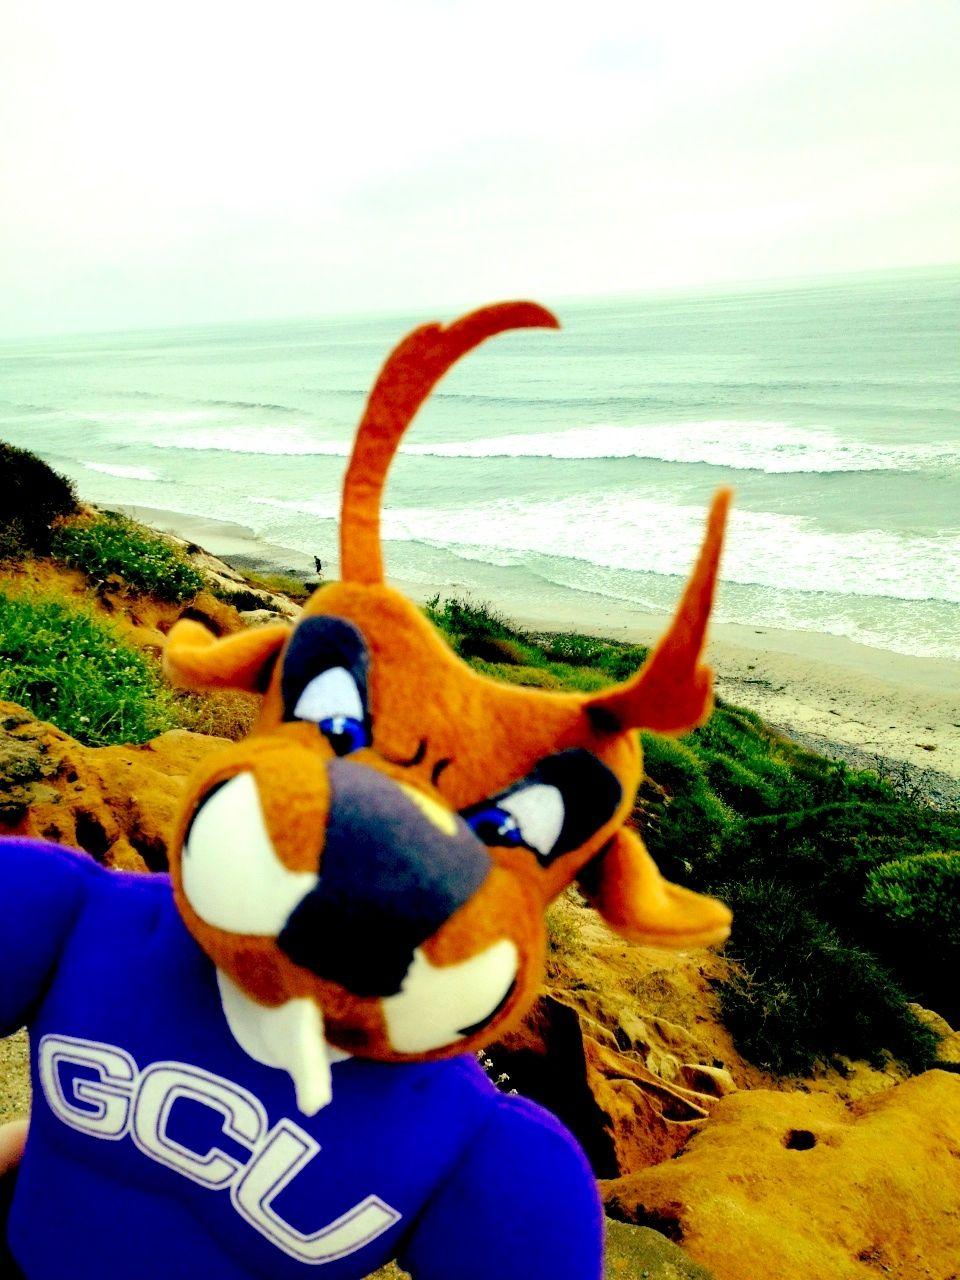 Thunder On The Beach Thundereverywhere Gcu Grandcanyonuniversity Grand Canyon University Pluto The Dog I School